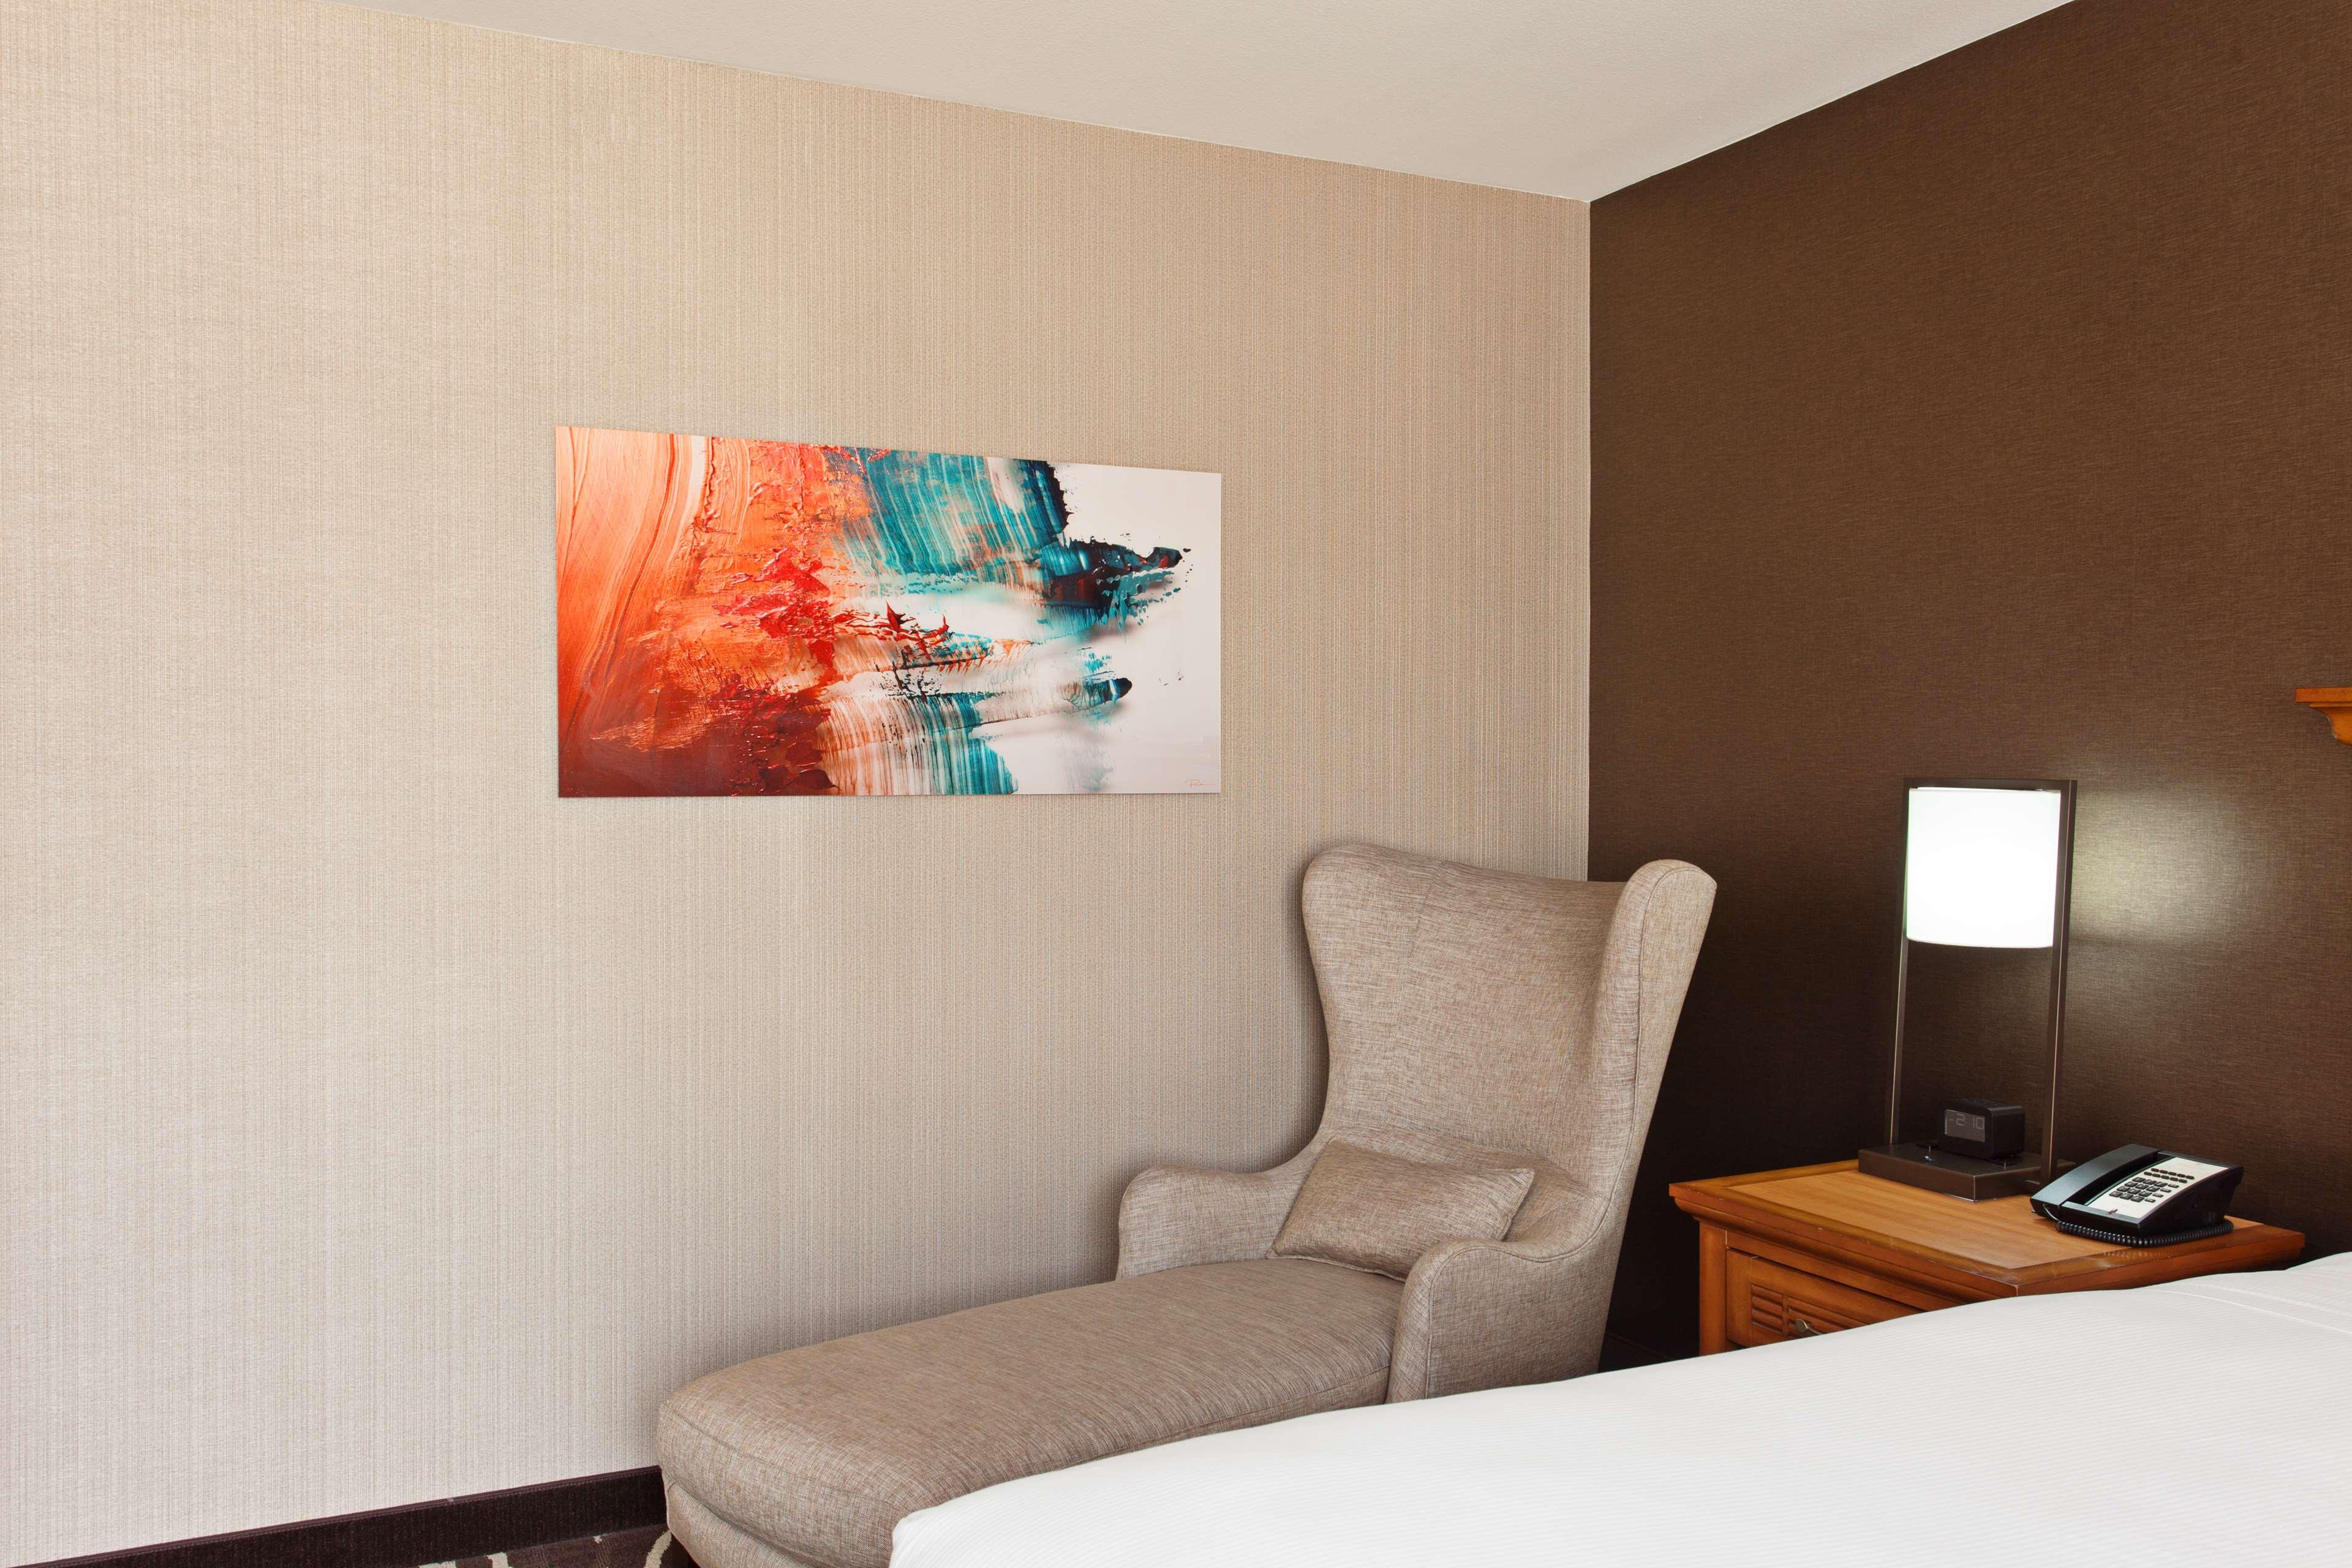 DoubleTree by Hilton Hotel San Bernardino image 32